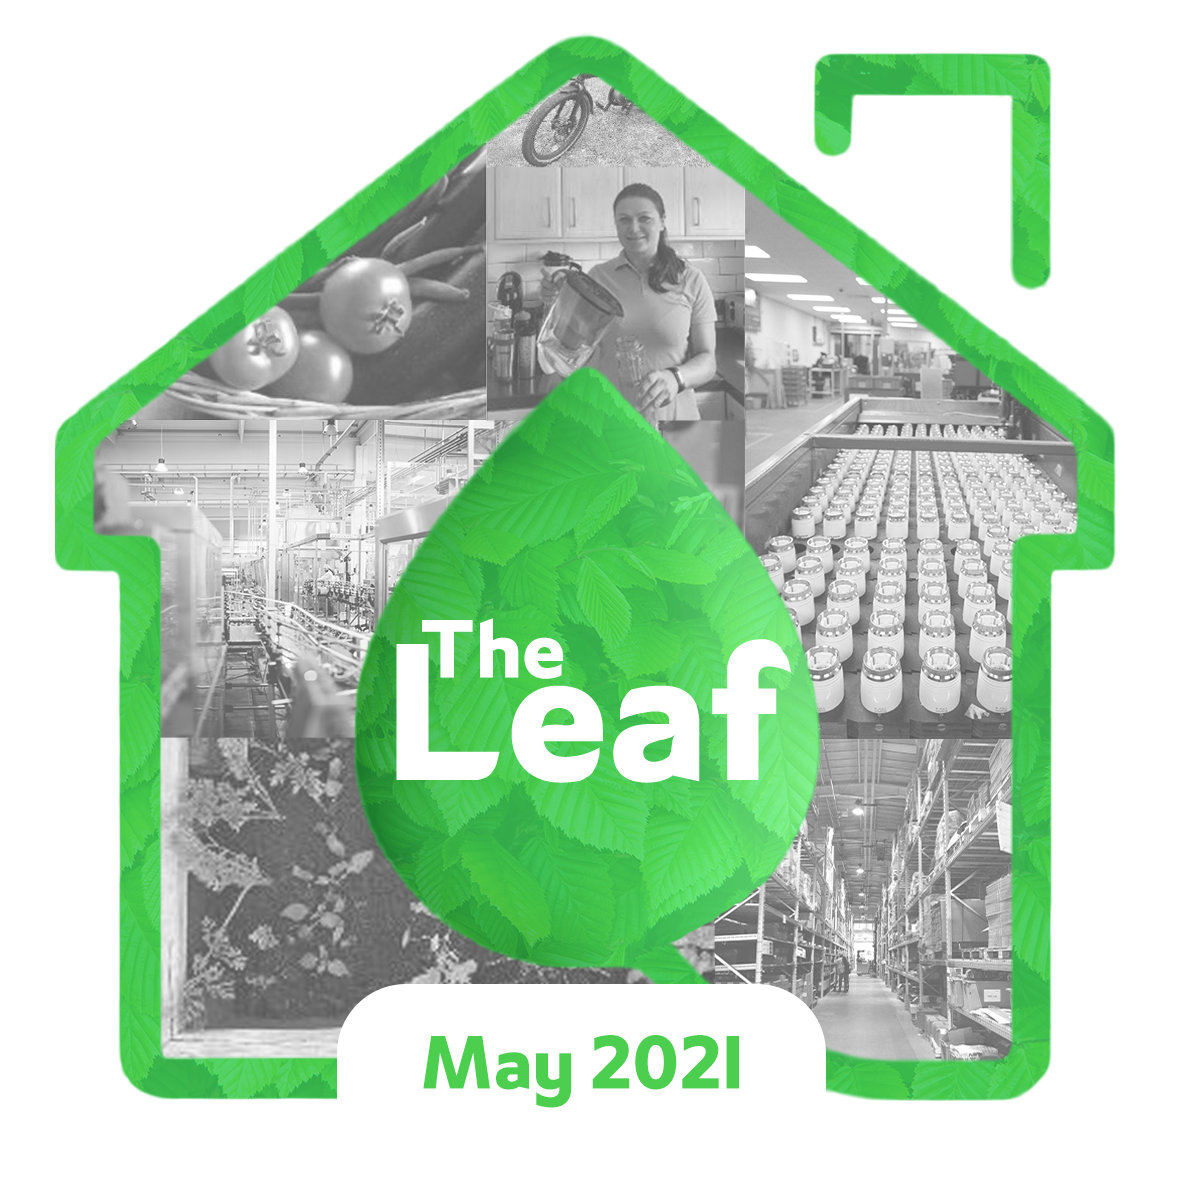 Drayton_corporate_sustainability_blog_The_Leaf_May_2021